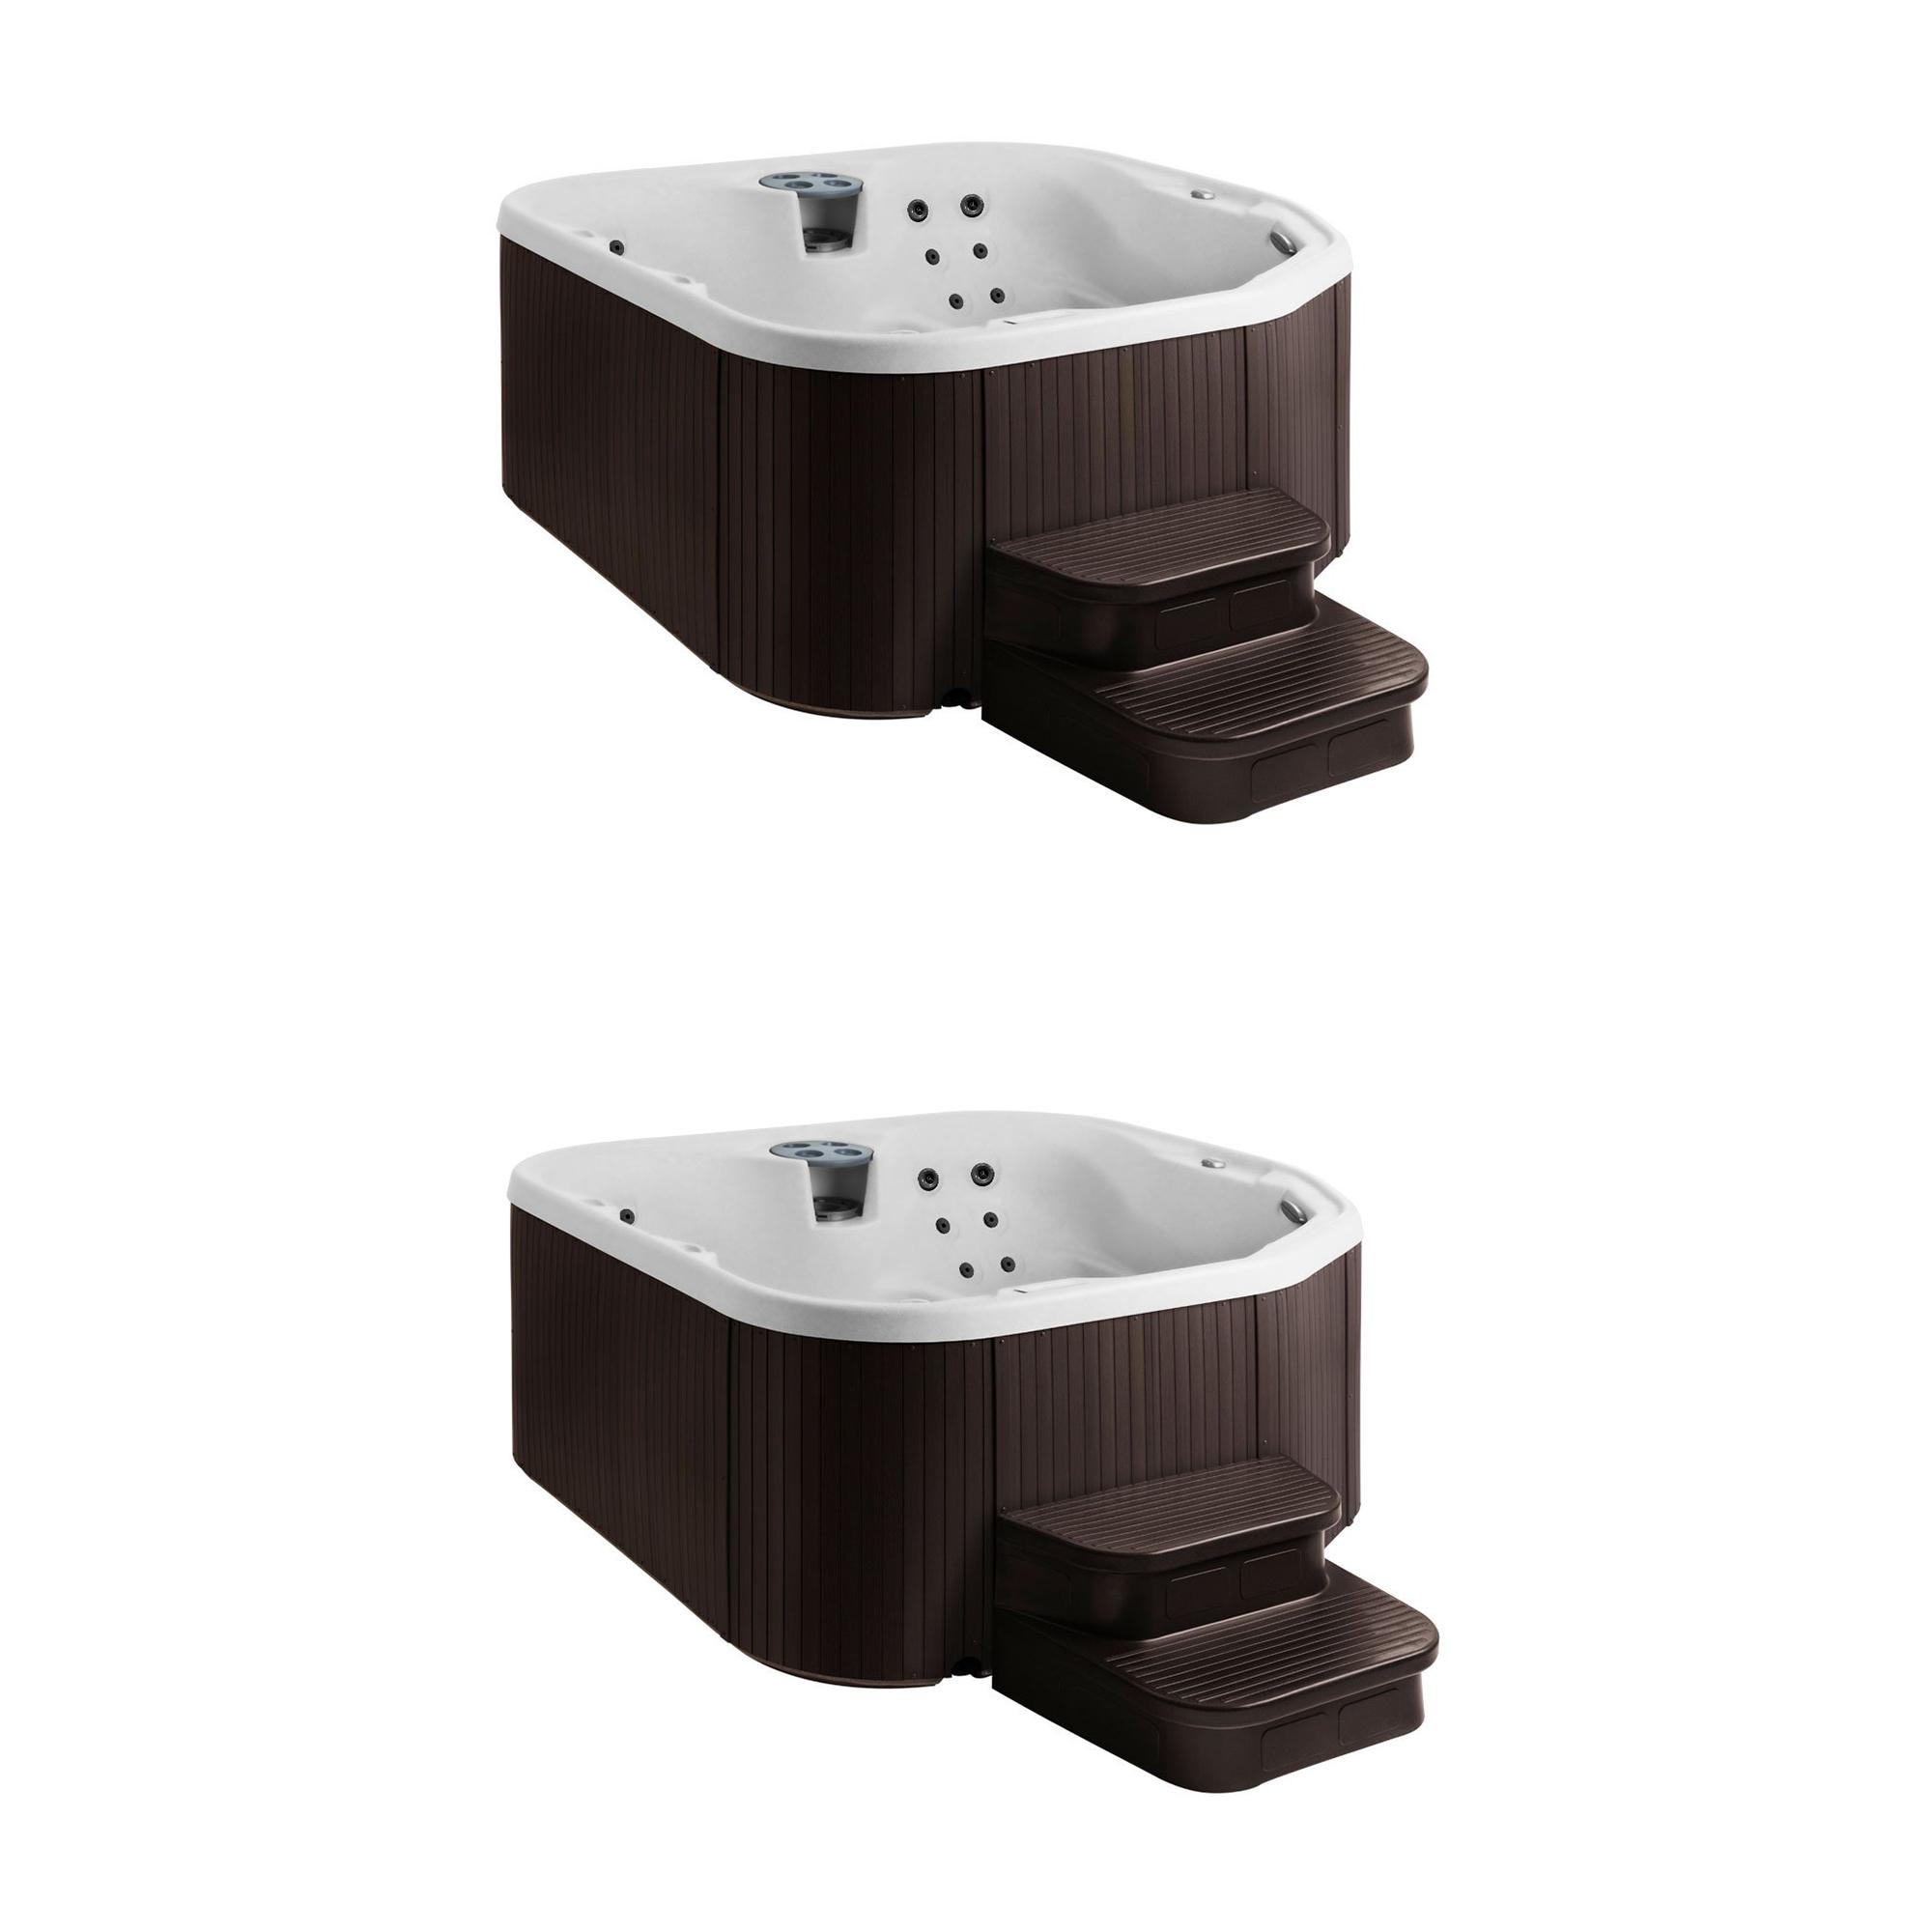 Admirable Lifesmart Spas 22 Jet 5 Person Hot Tub With Multi Color Led Lights 2 Pack Machost Co Dining Chair Design Ideas Machostcouk